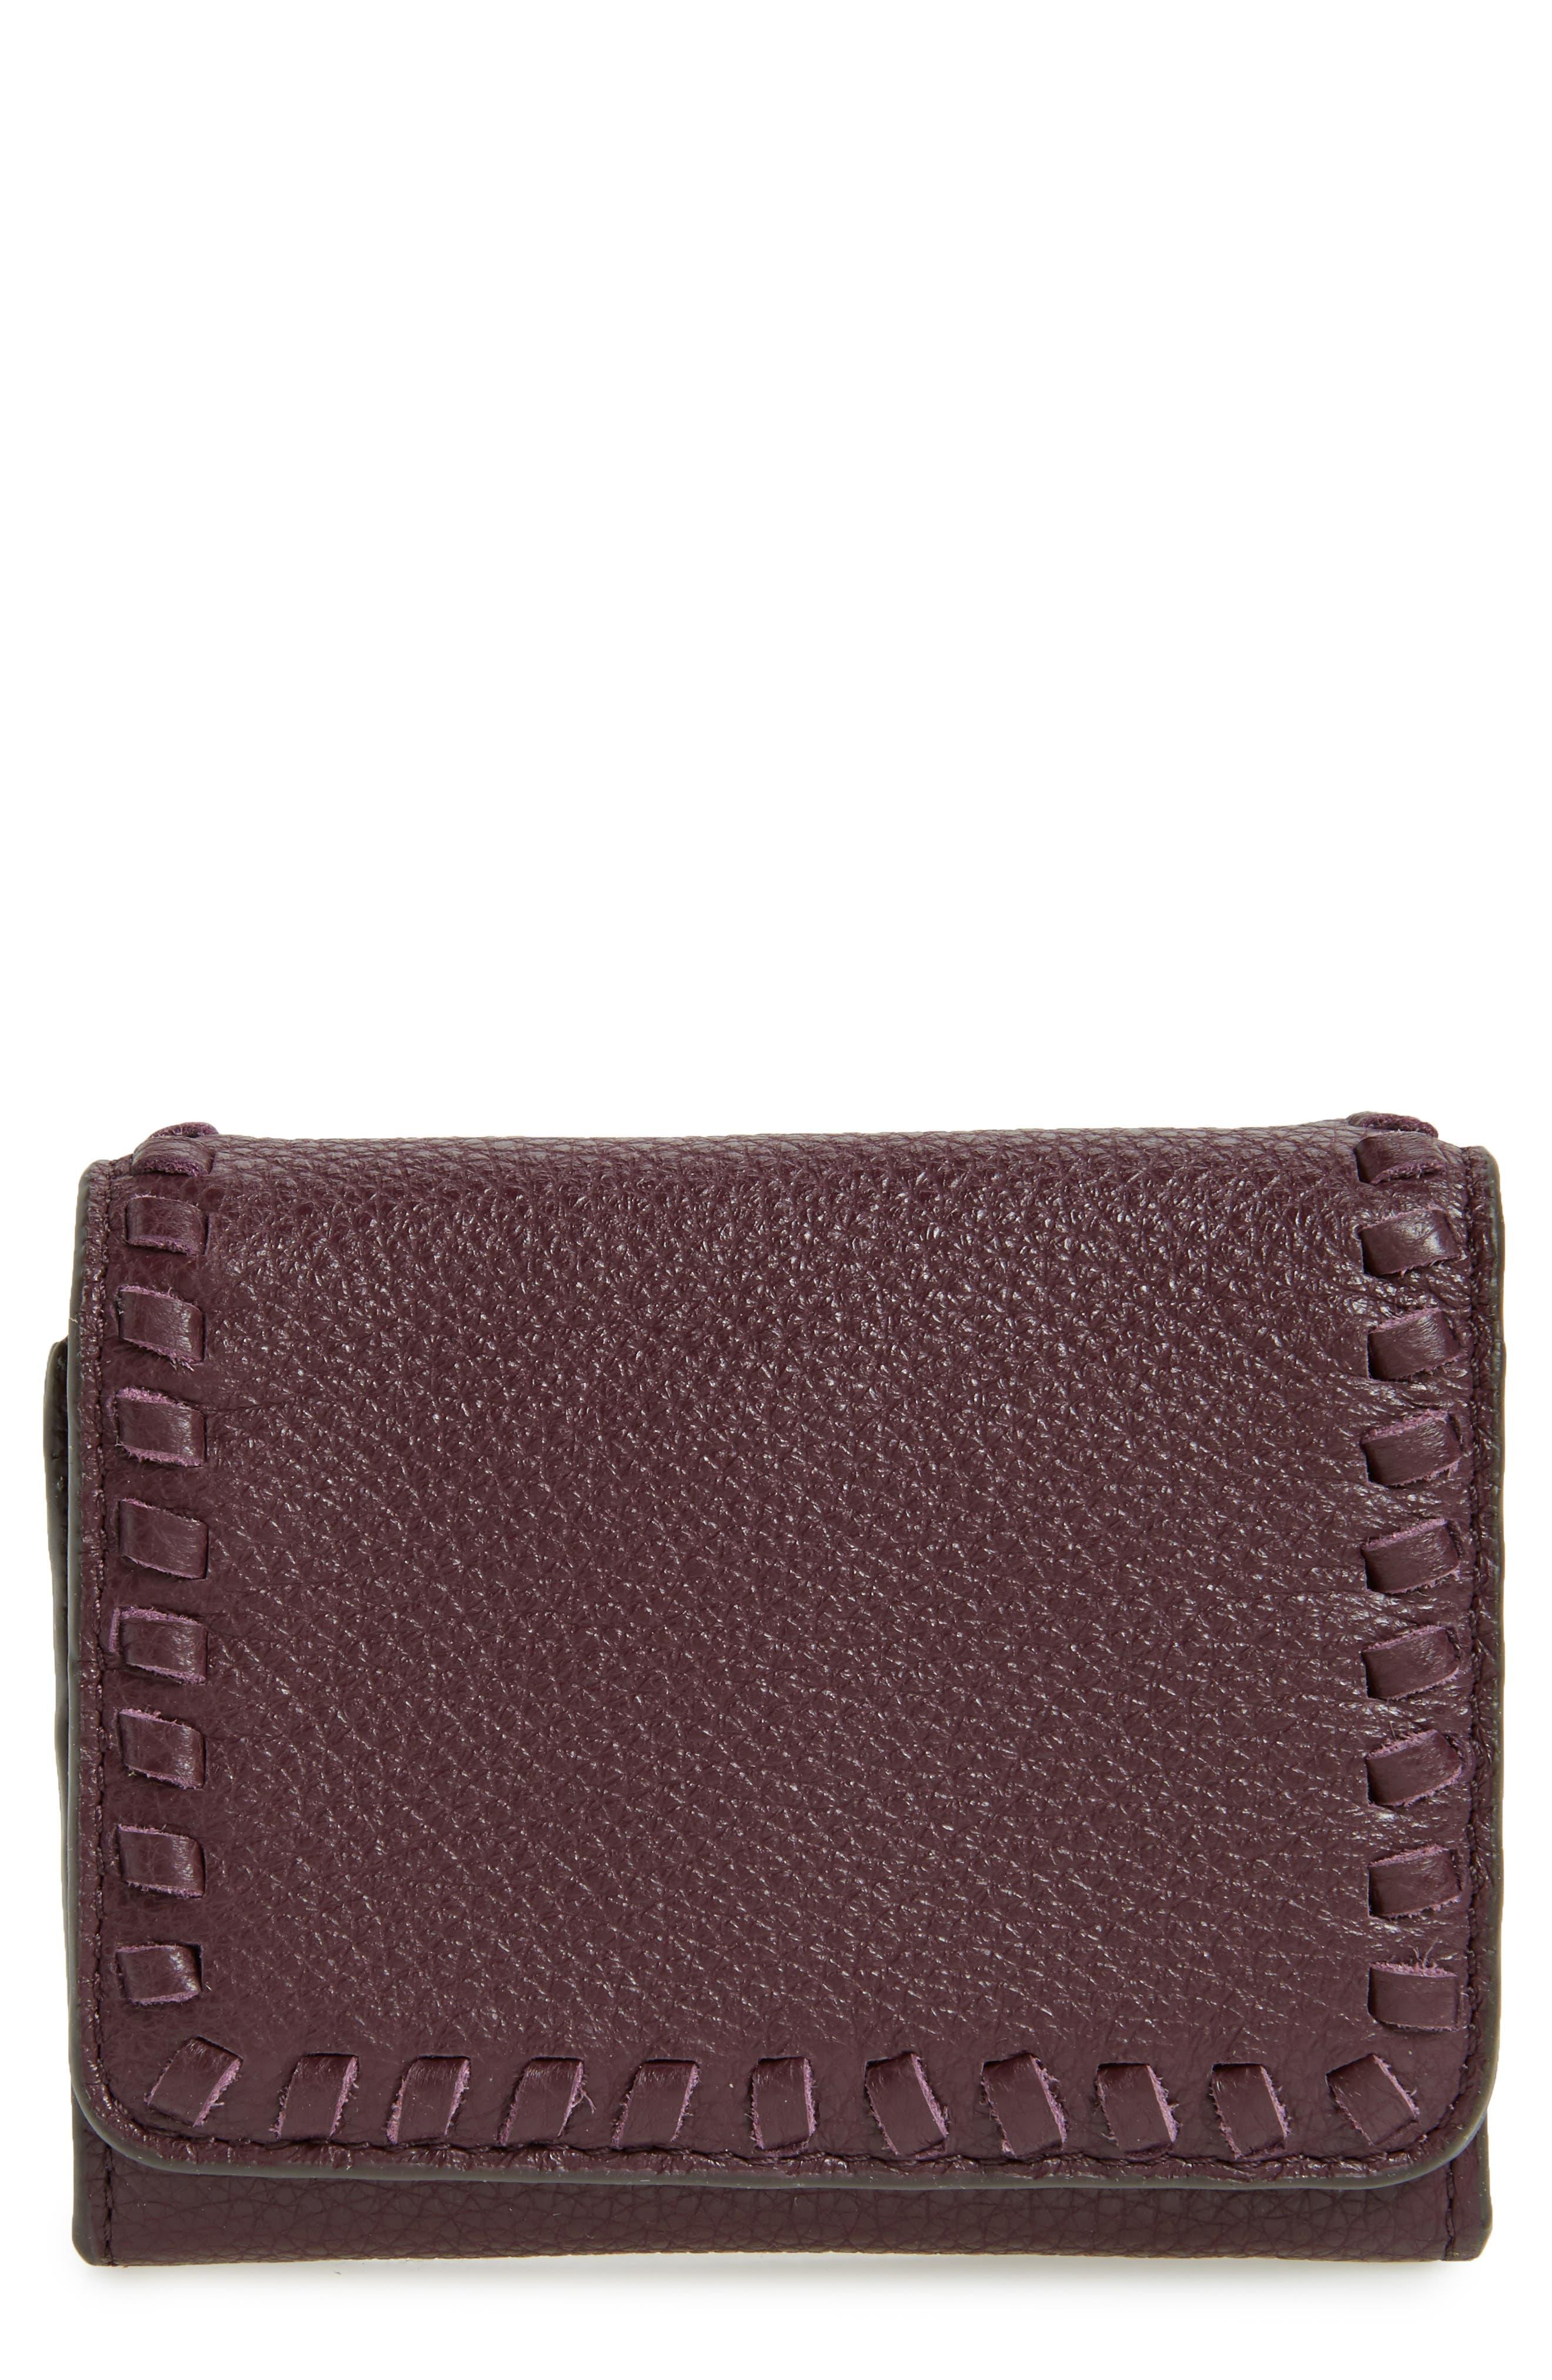 Mini Vanity Leather Wallet,                             Main thumbnail 1, color,                             610